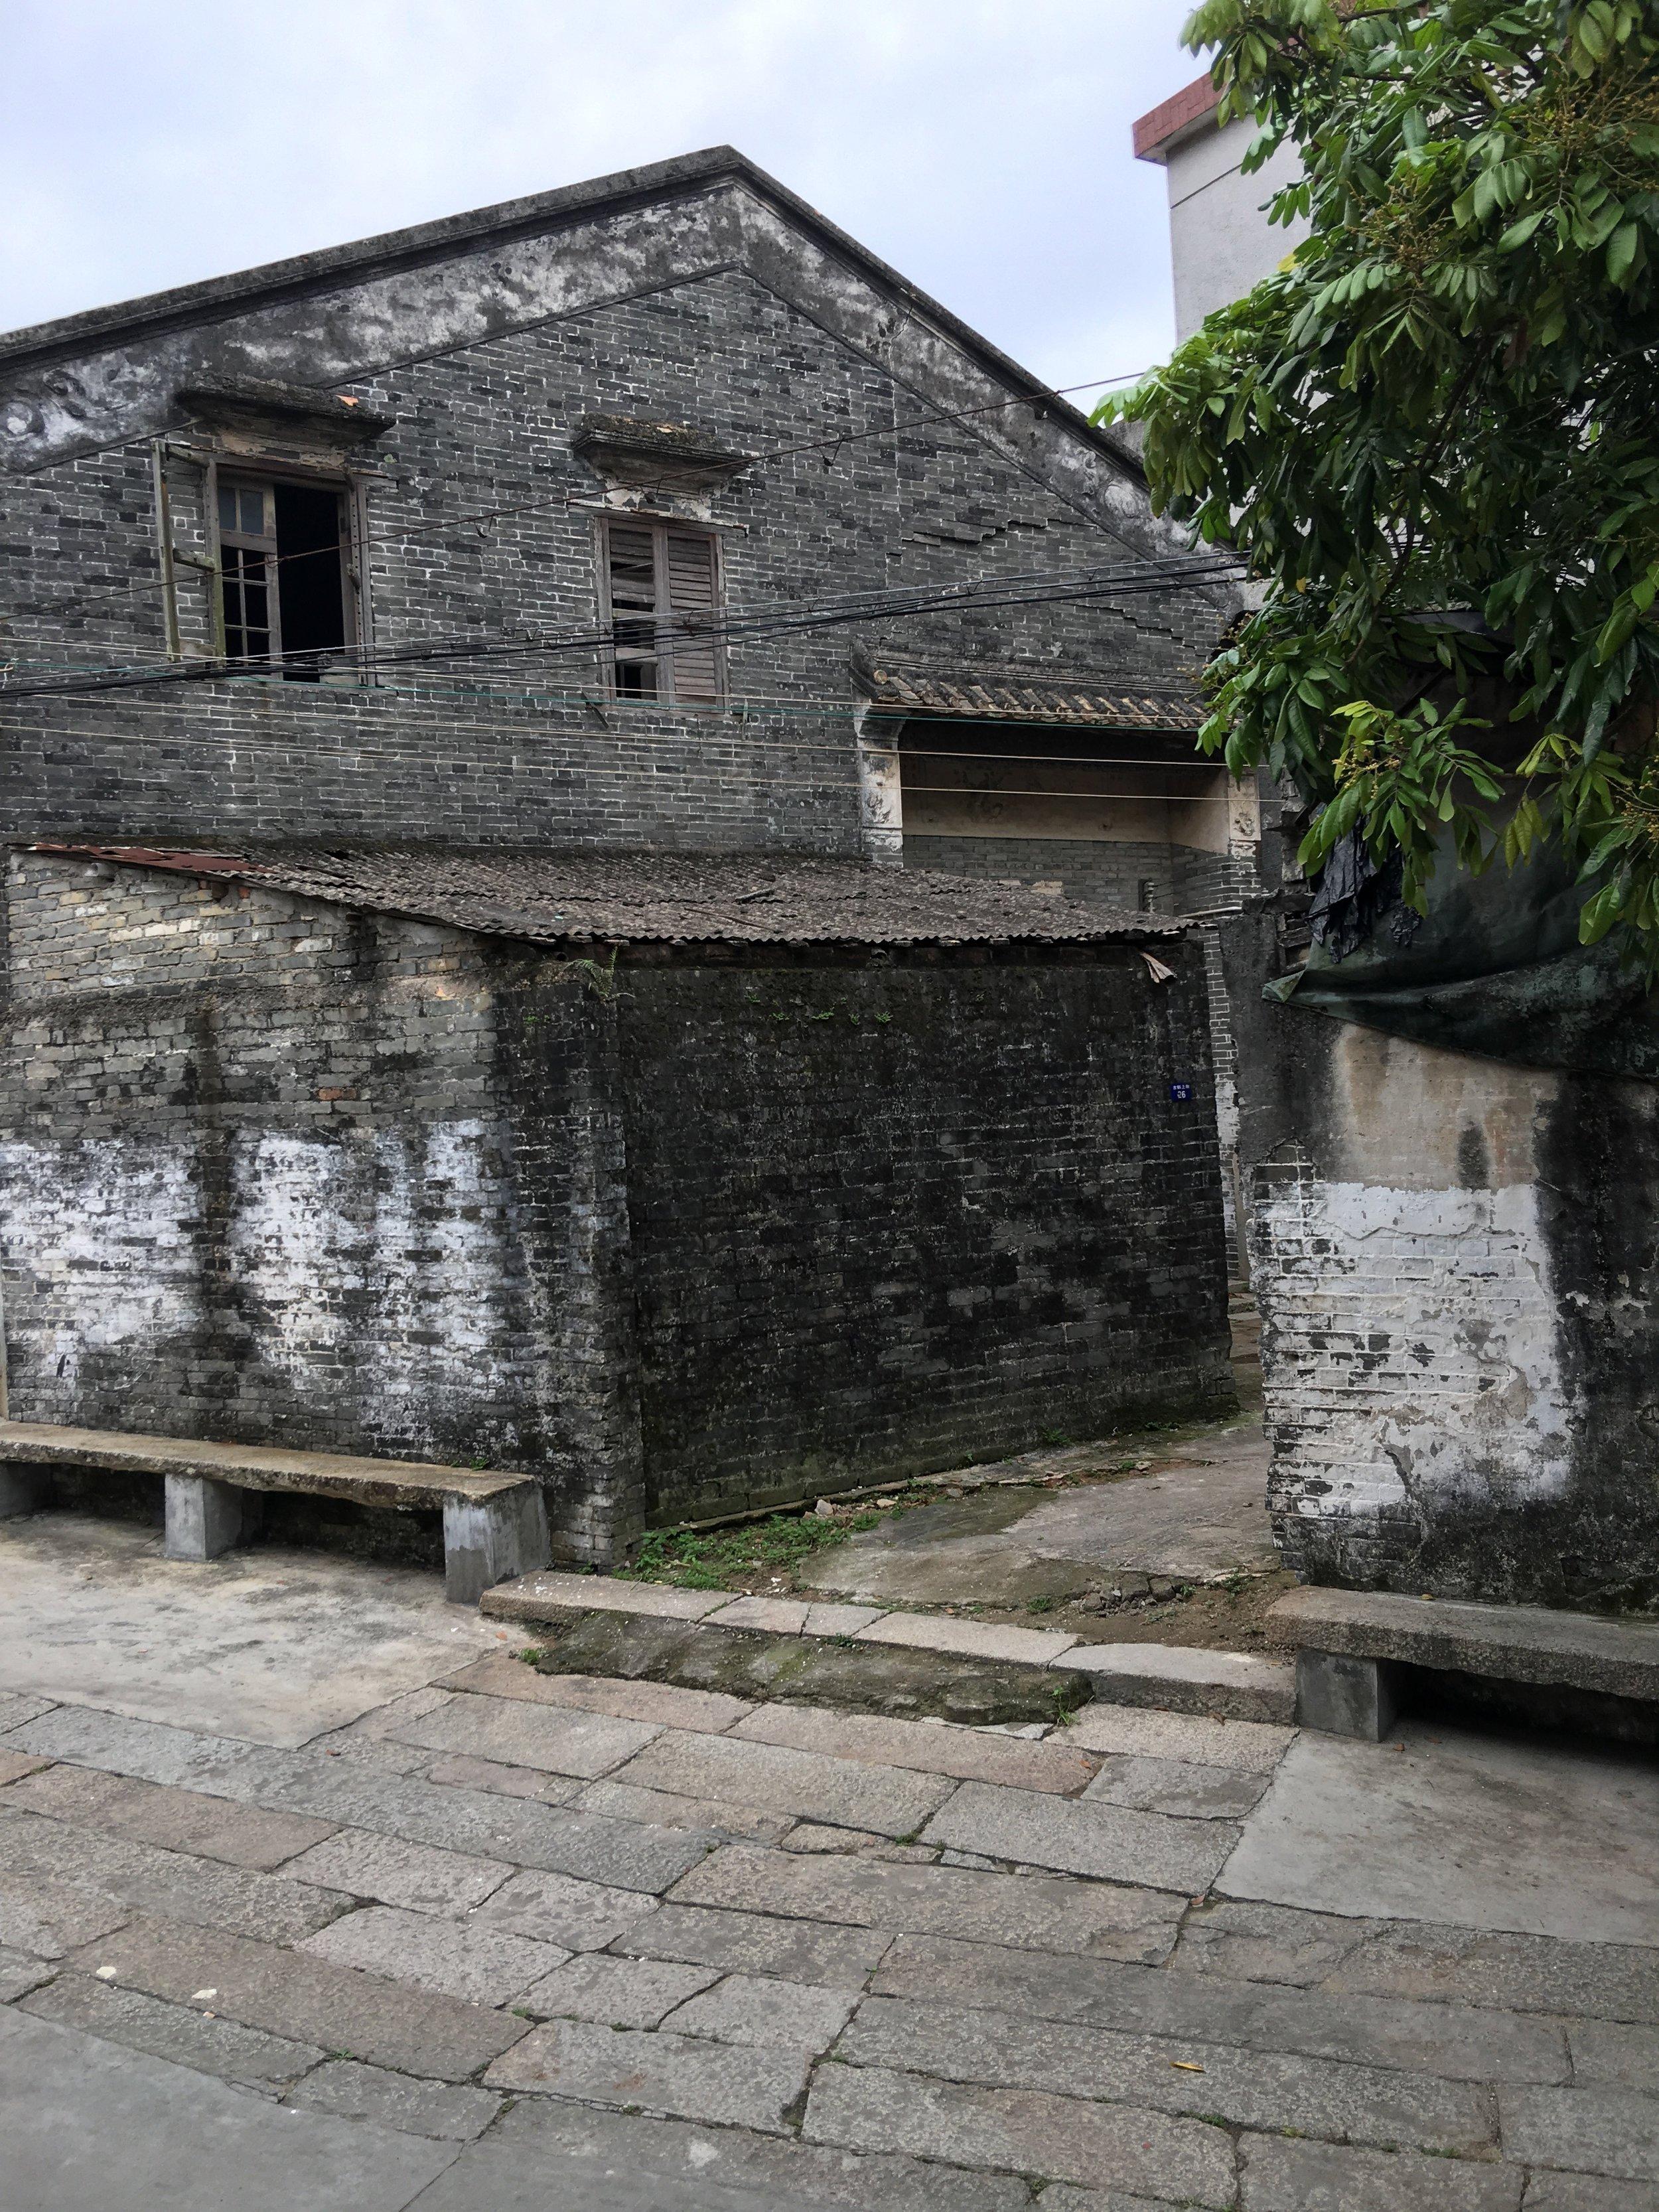 Cheong family house, Guhe